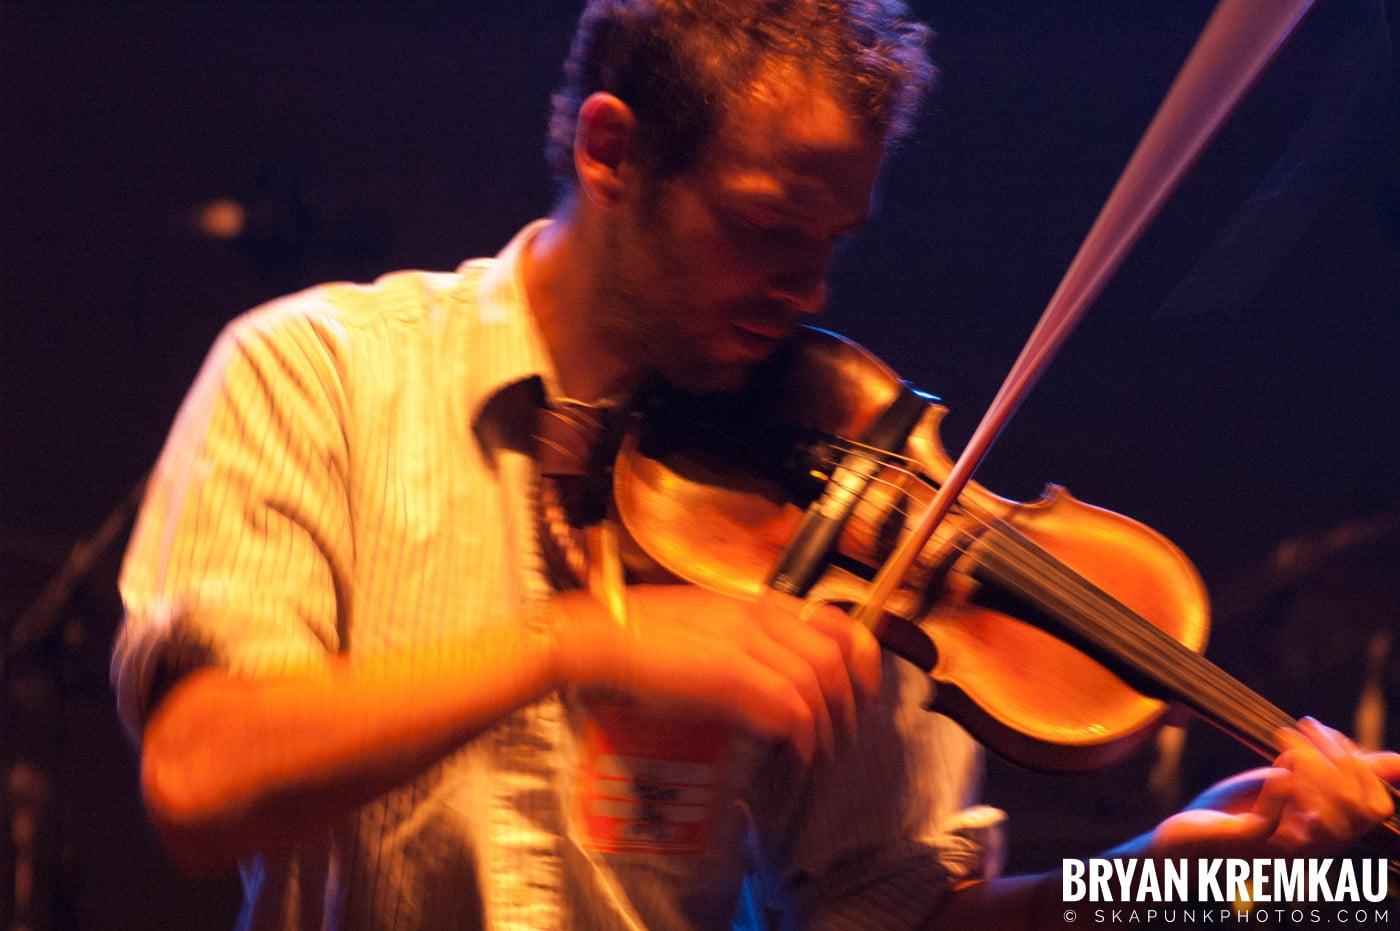 Larrikin Love @ Brixton Academy, London UK - 12.17.06 (8)